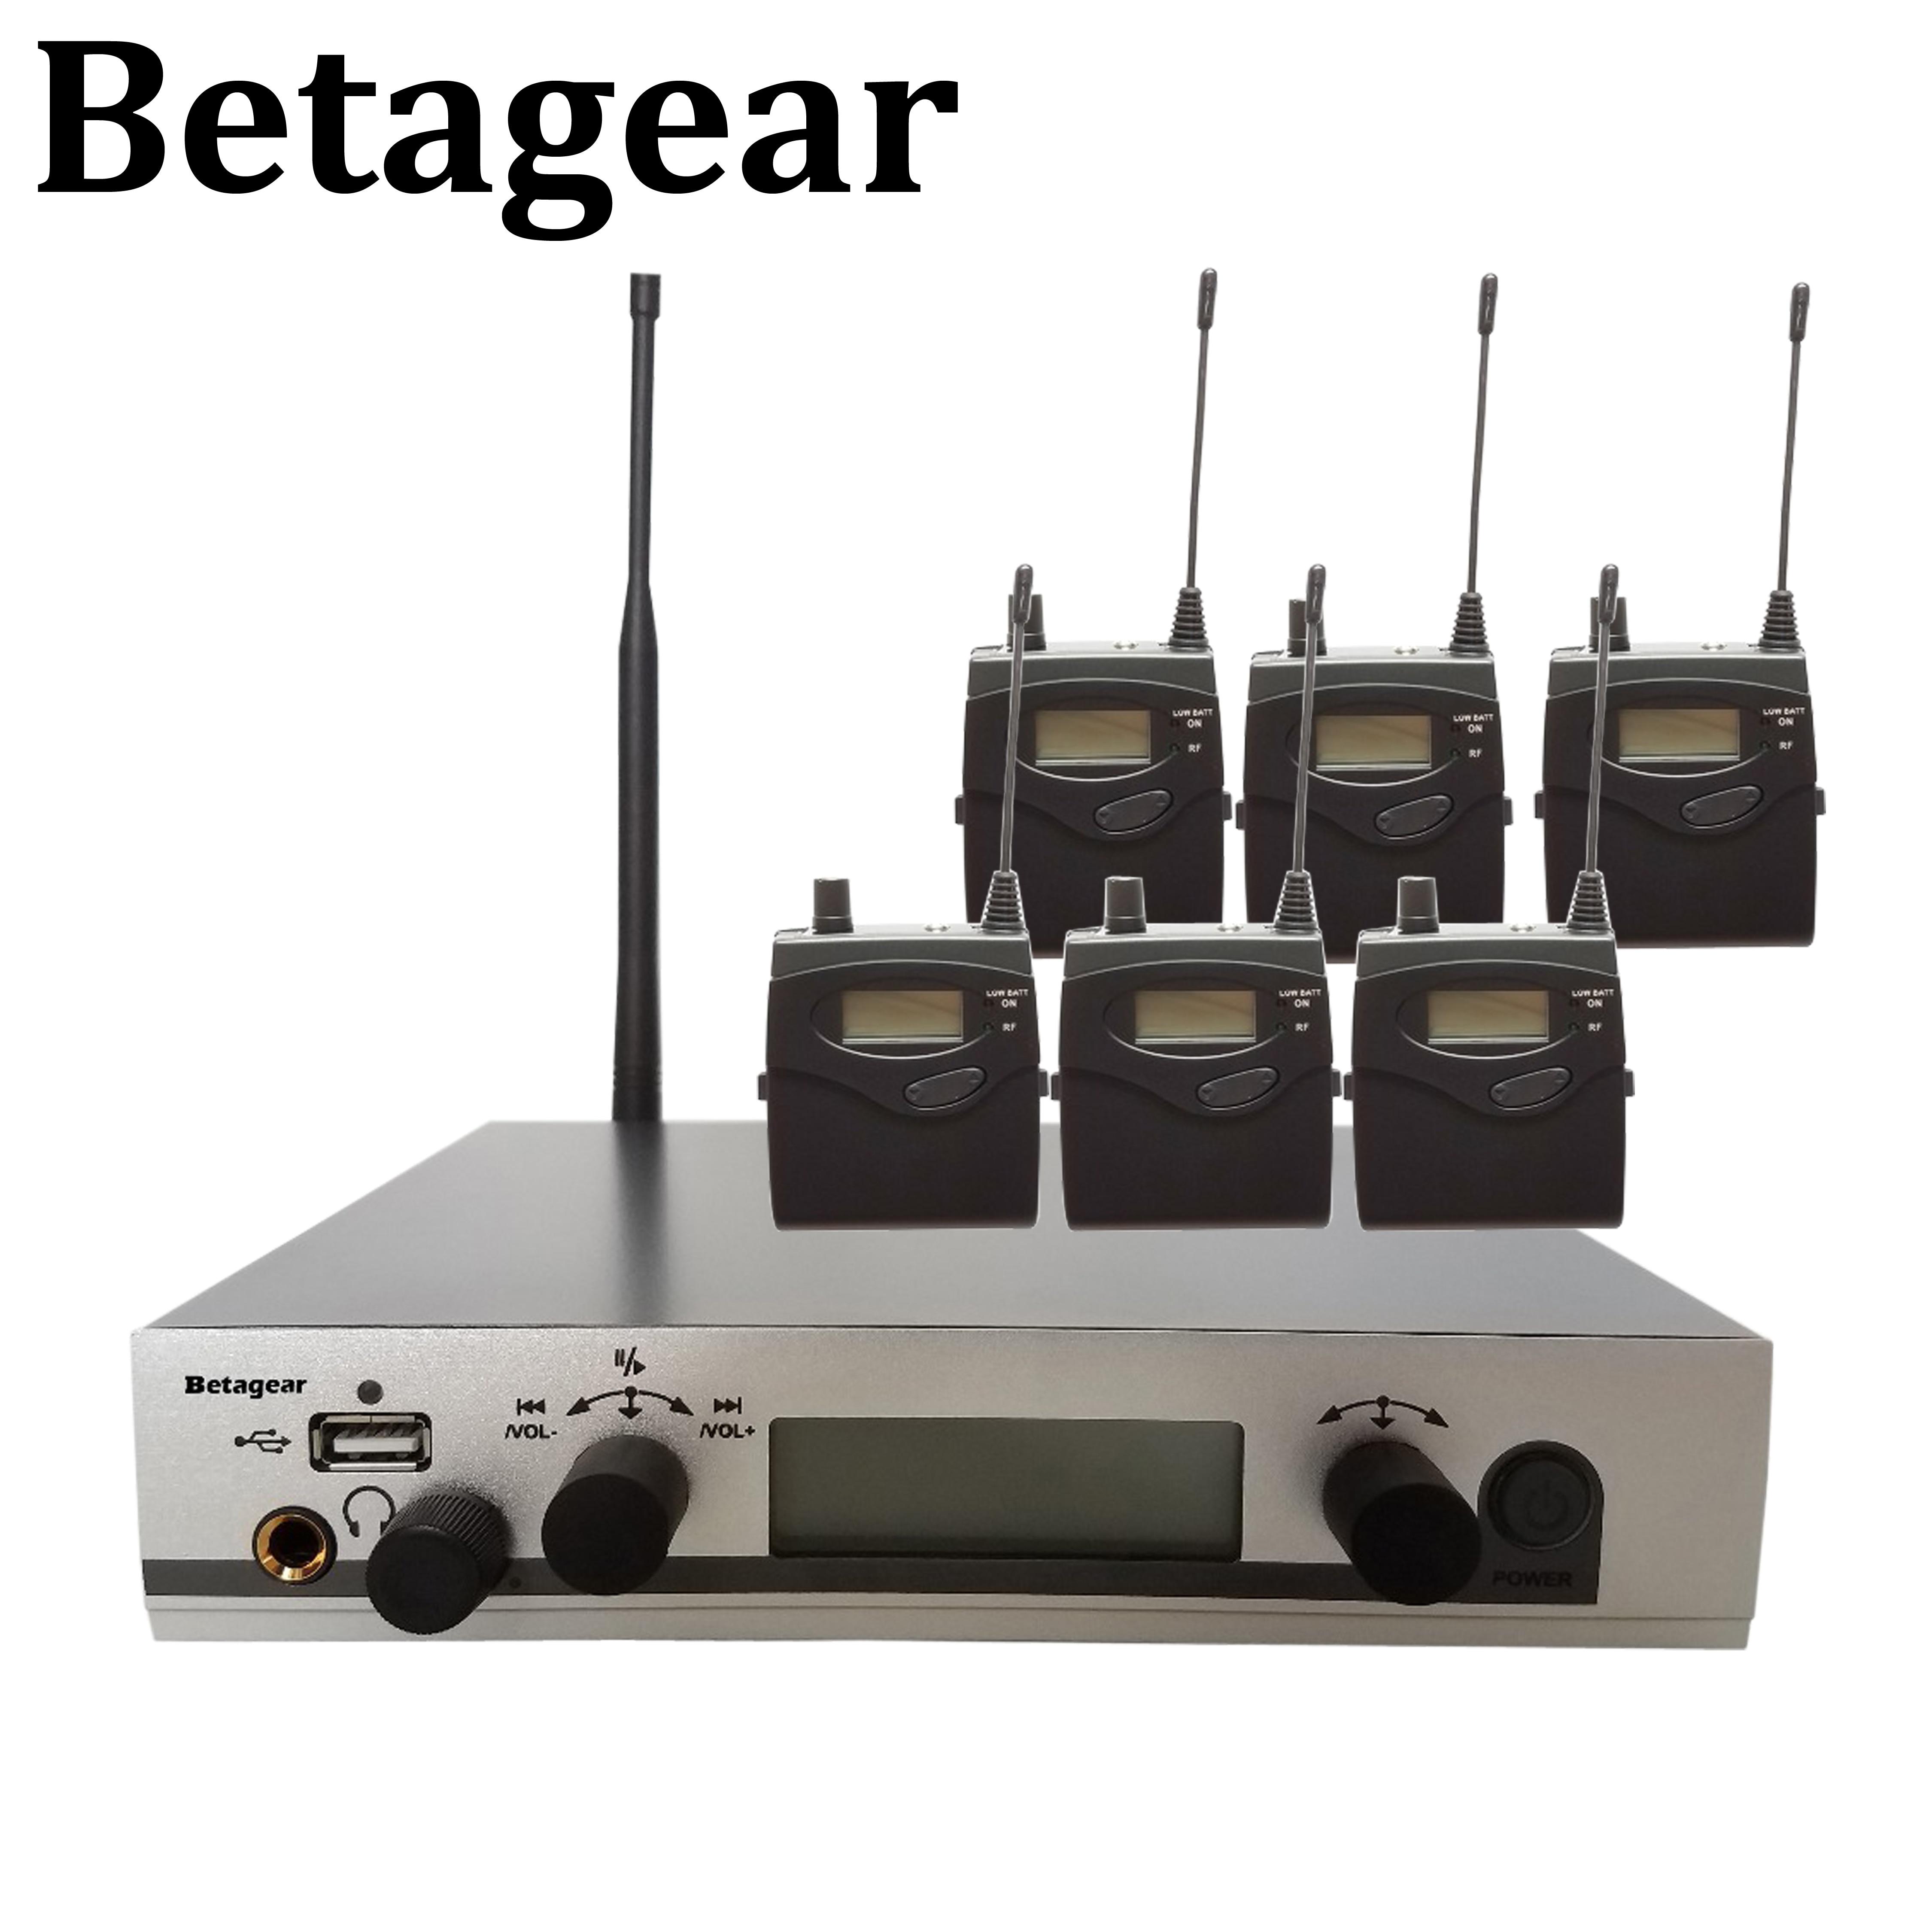 Betagear In-ohr Überwachung System 300IEM G3 SR300 IEM Persönlichen Monitor Drahtlose System in ear-monitor-system audio profesional